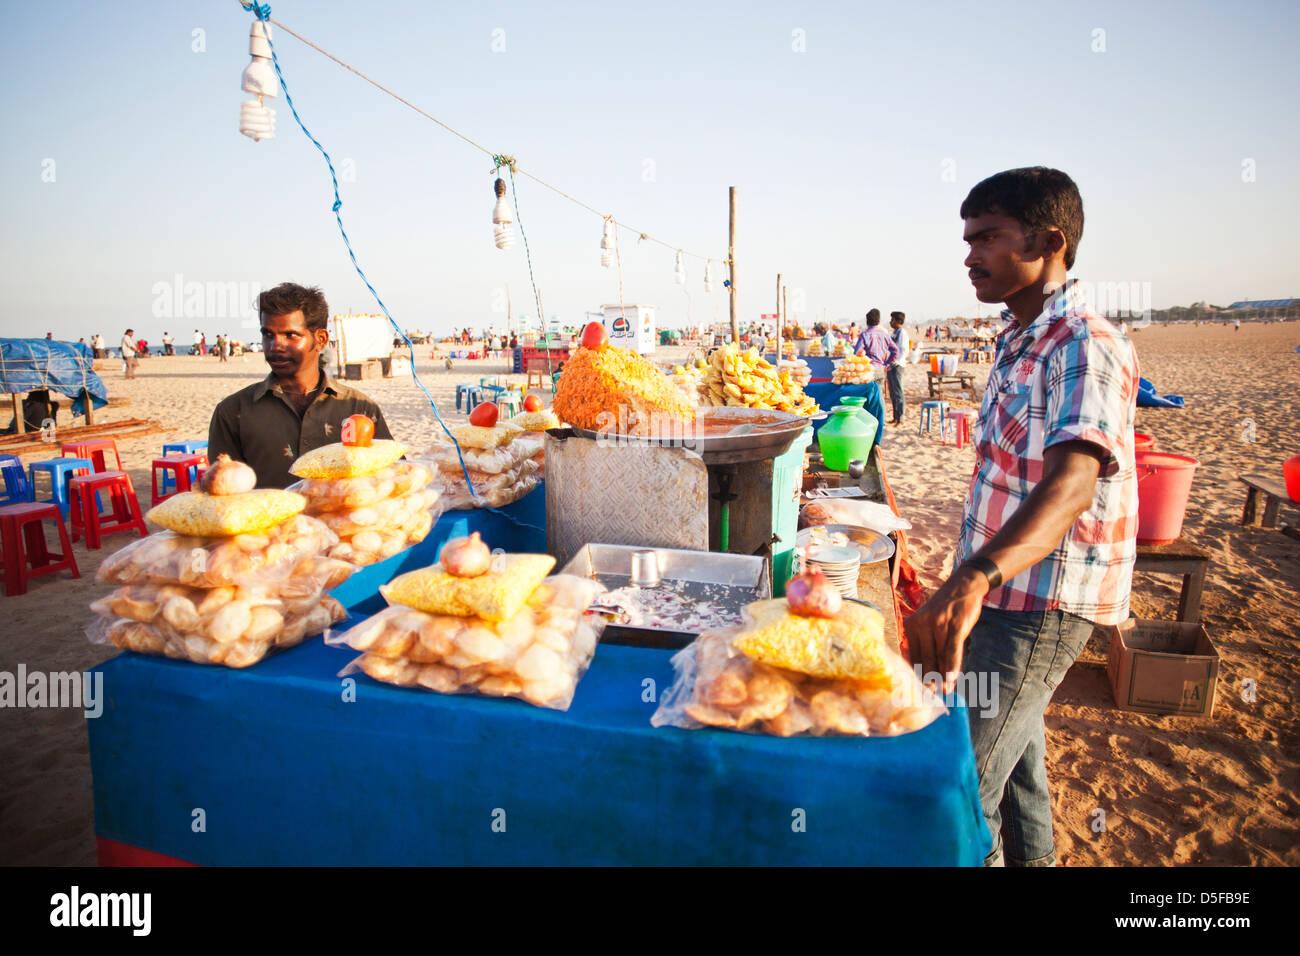 Food stalls on the beach, Chennai, Tamil Nadu, India - Stock Image